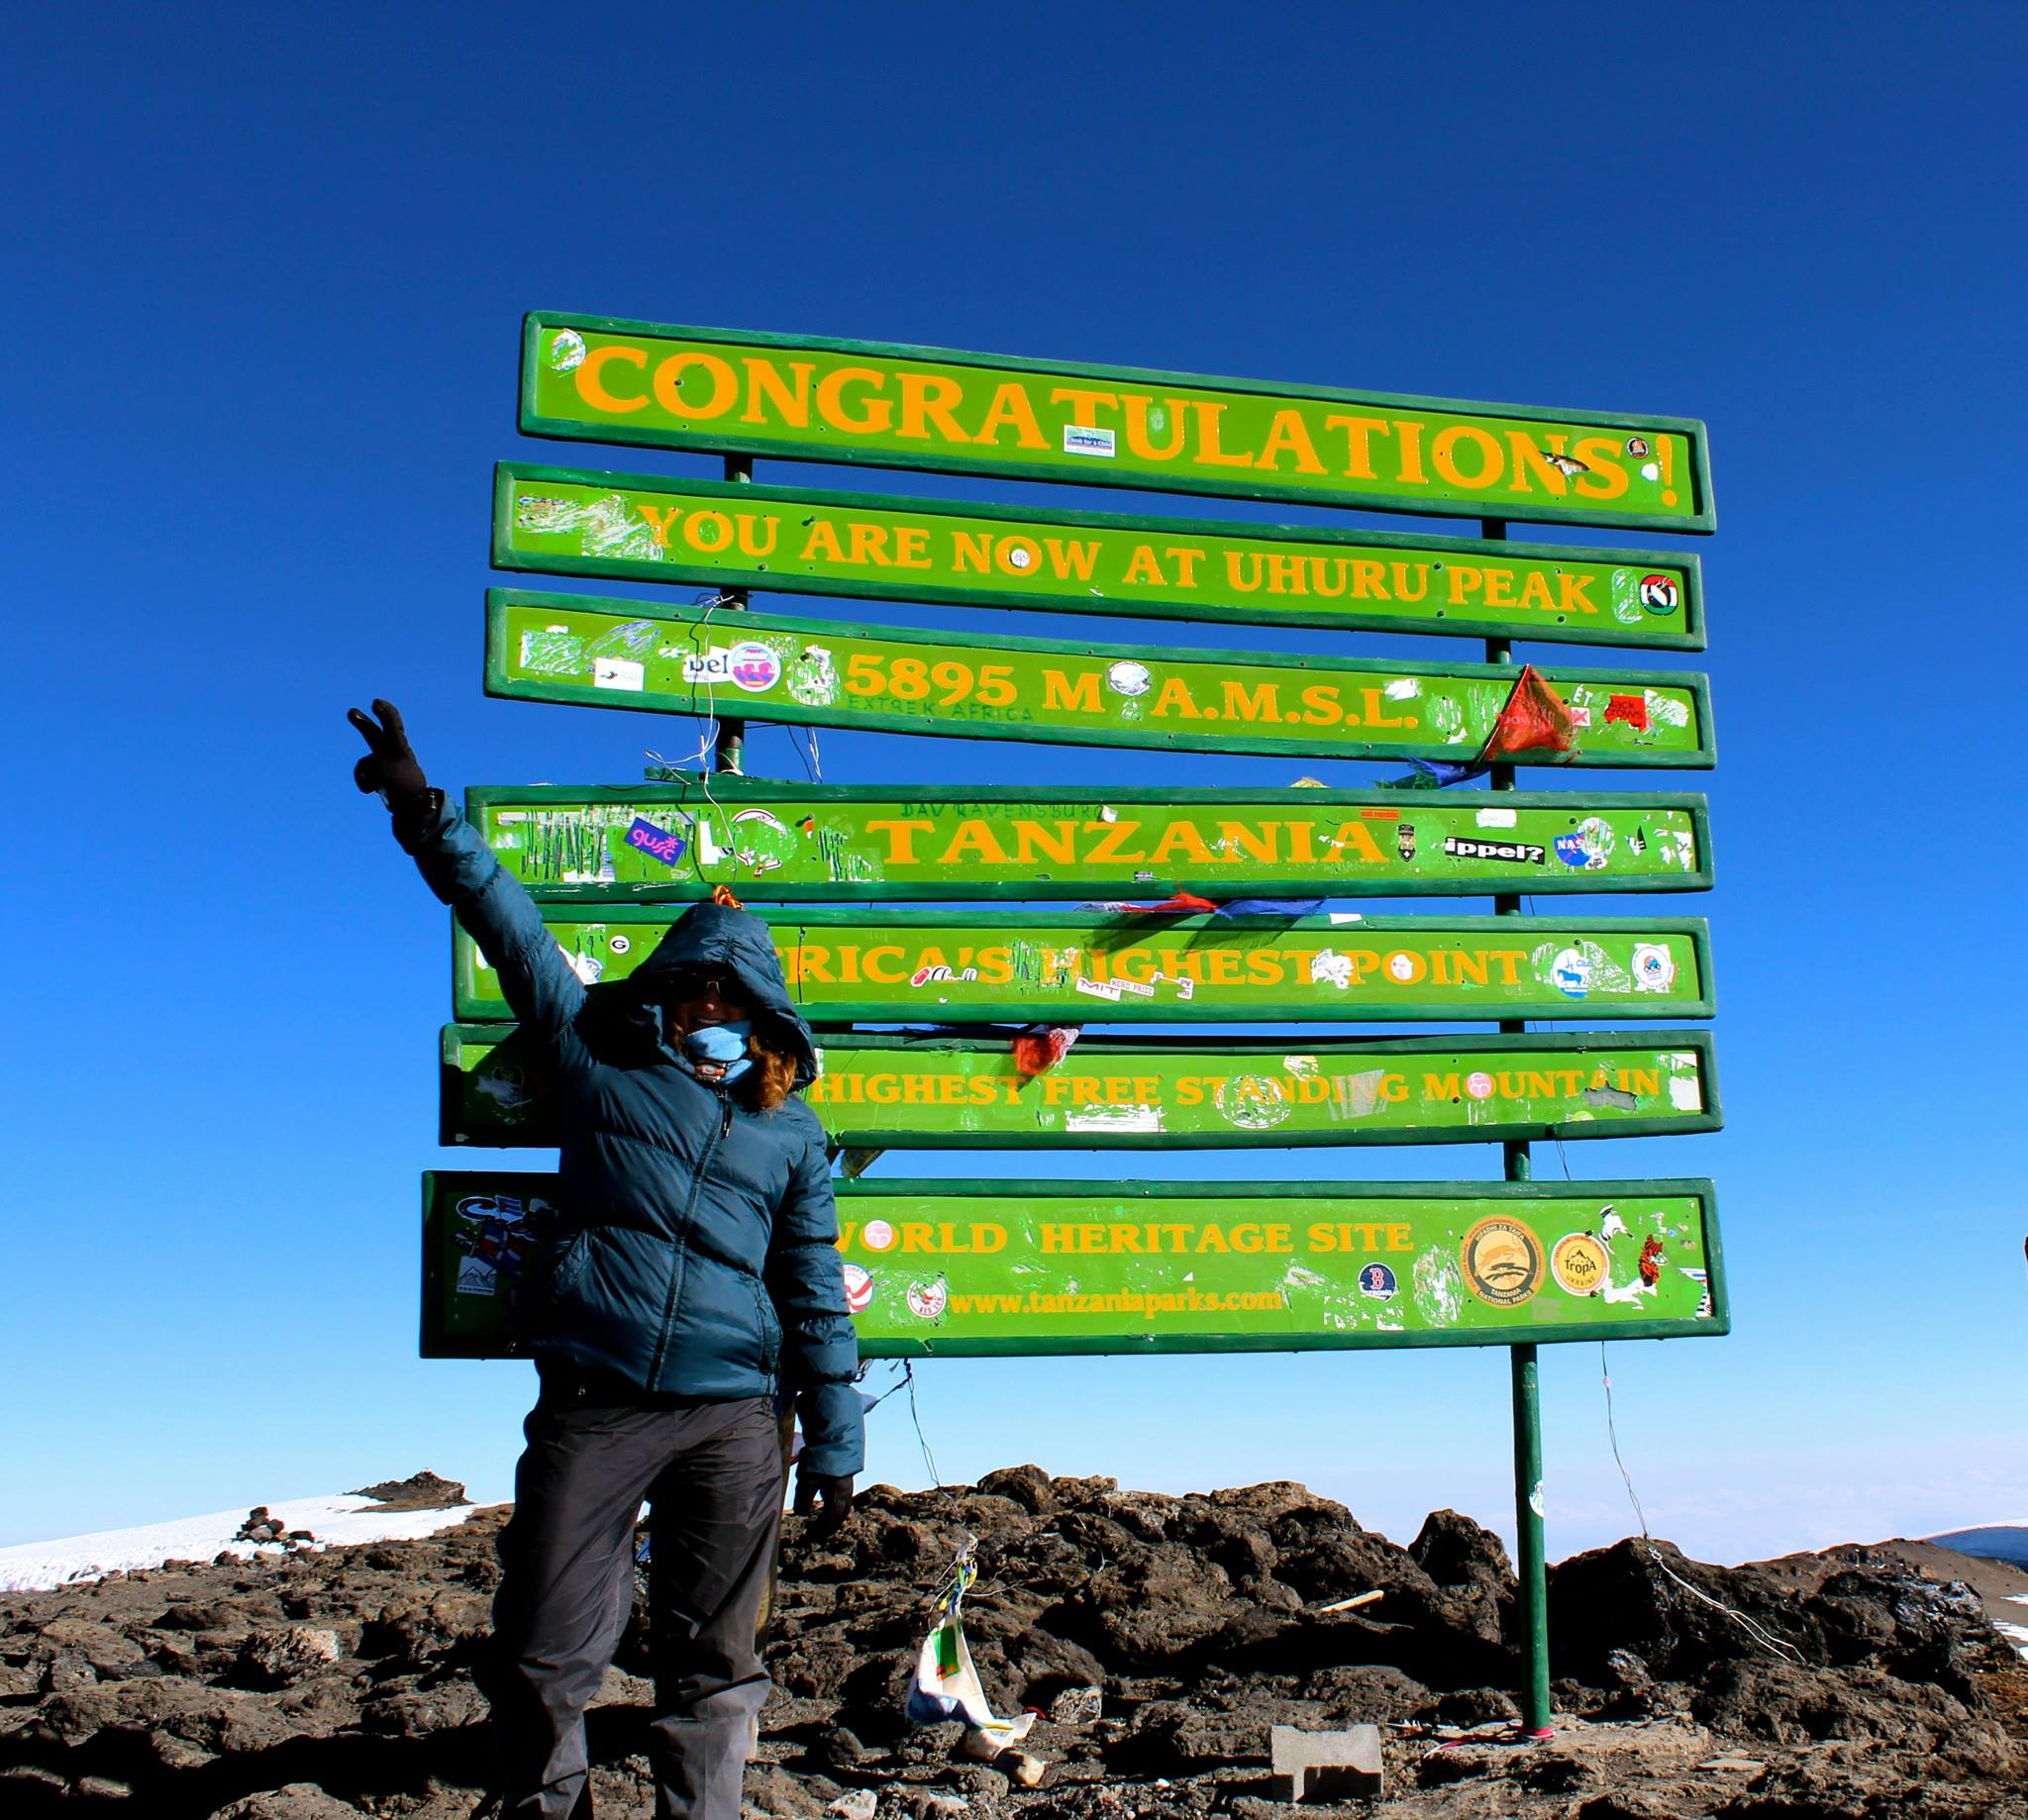 At the Summit of Mt. Kilimanjaro